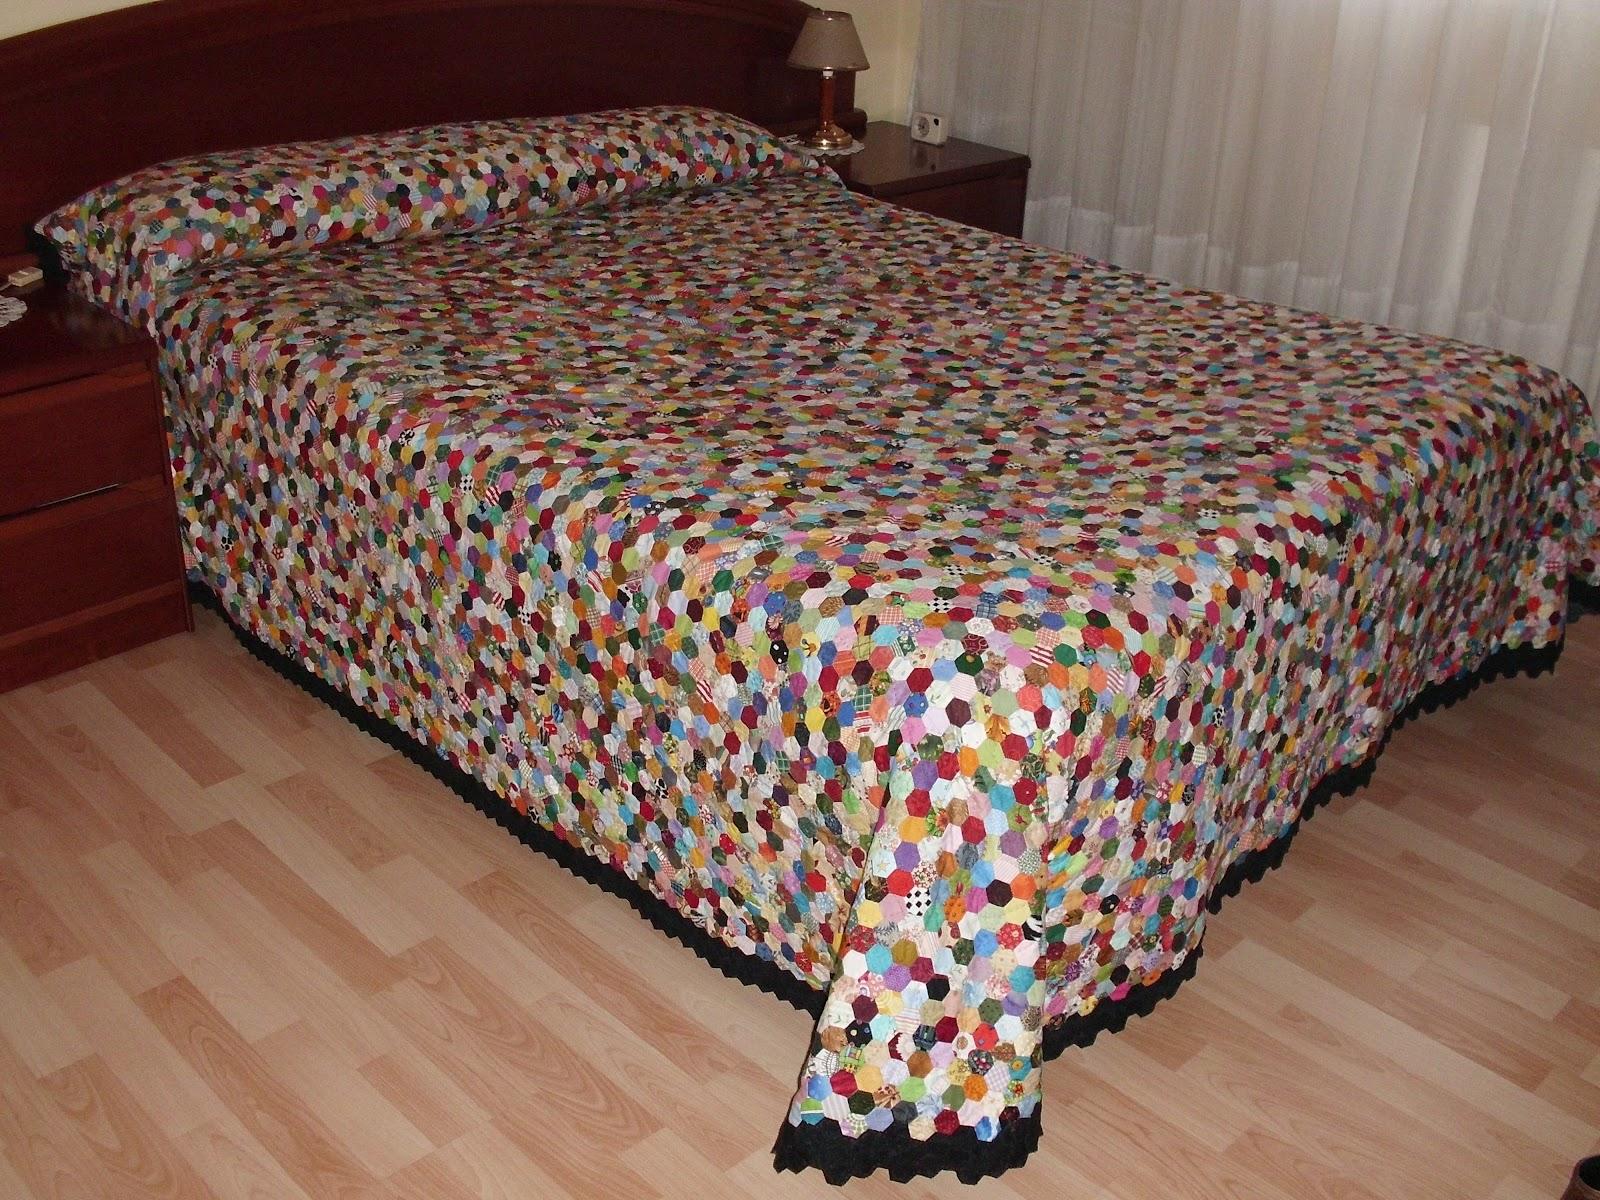 Espe patchwork septiembre 2012 - Como hacer colchas de patchwork ...